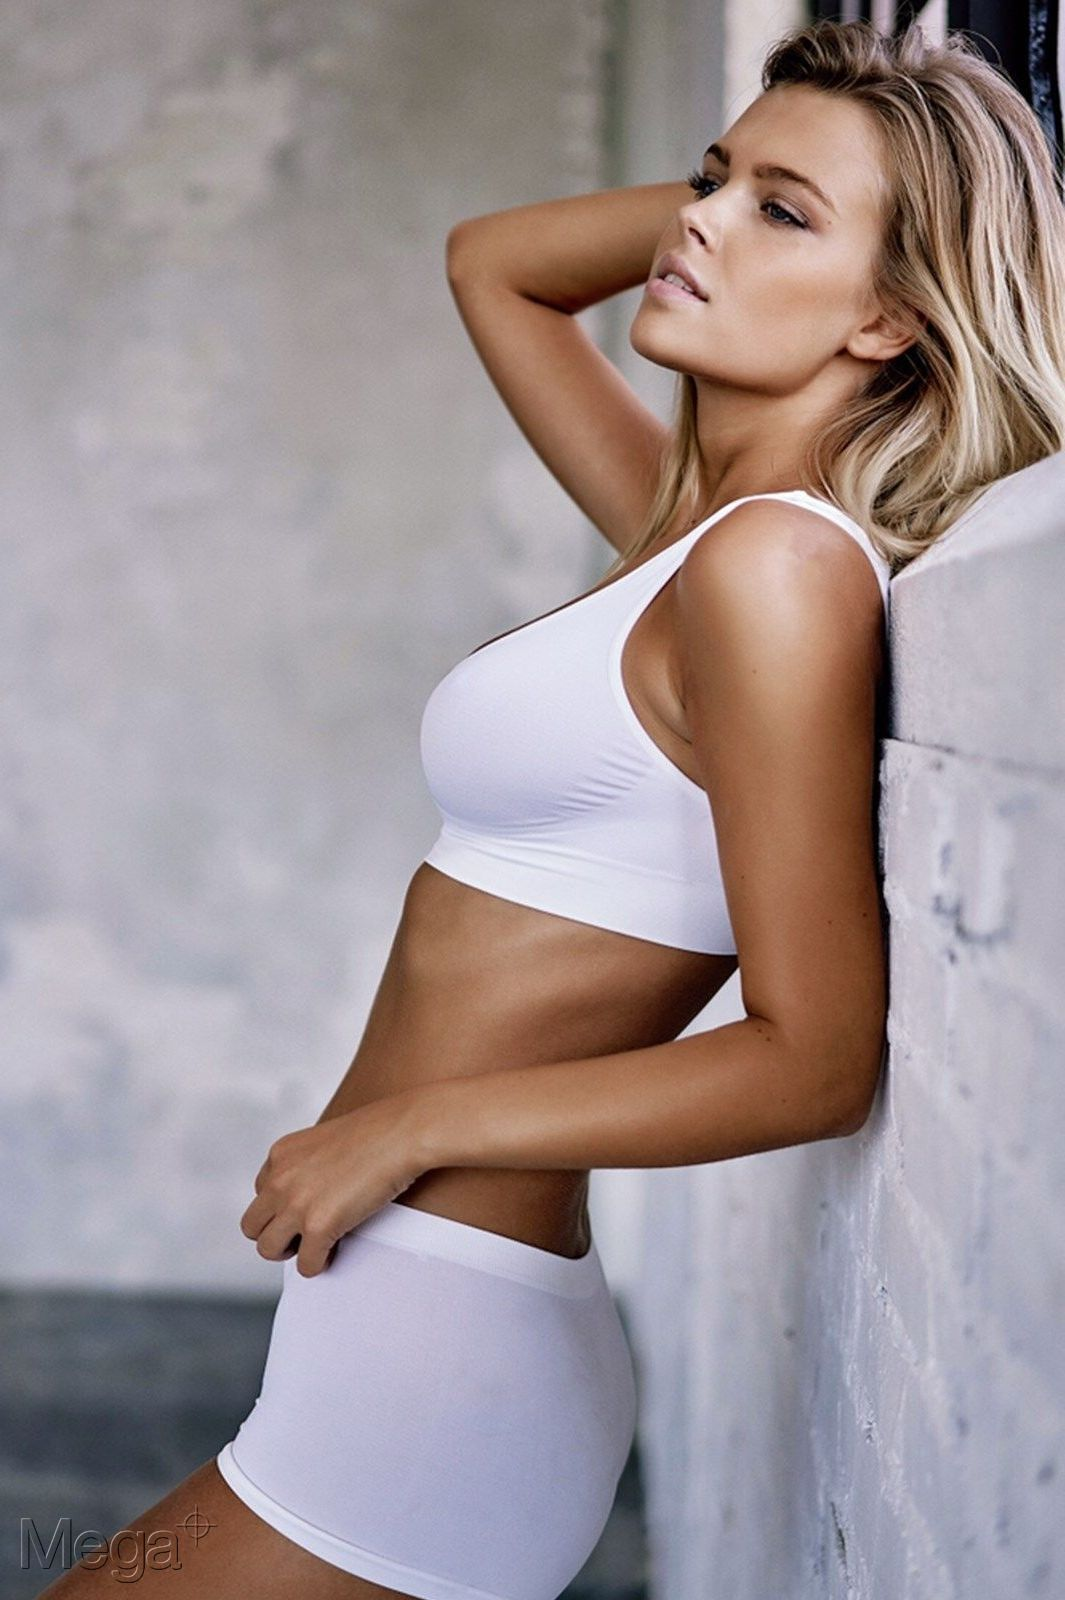 Kim Dammer Mega Model Agency